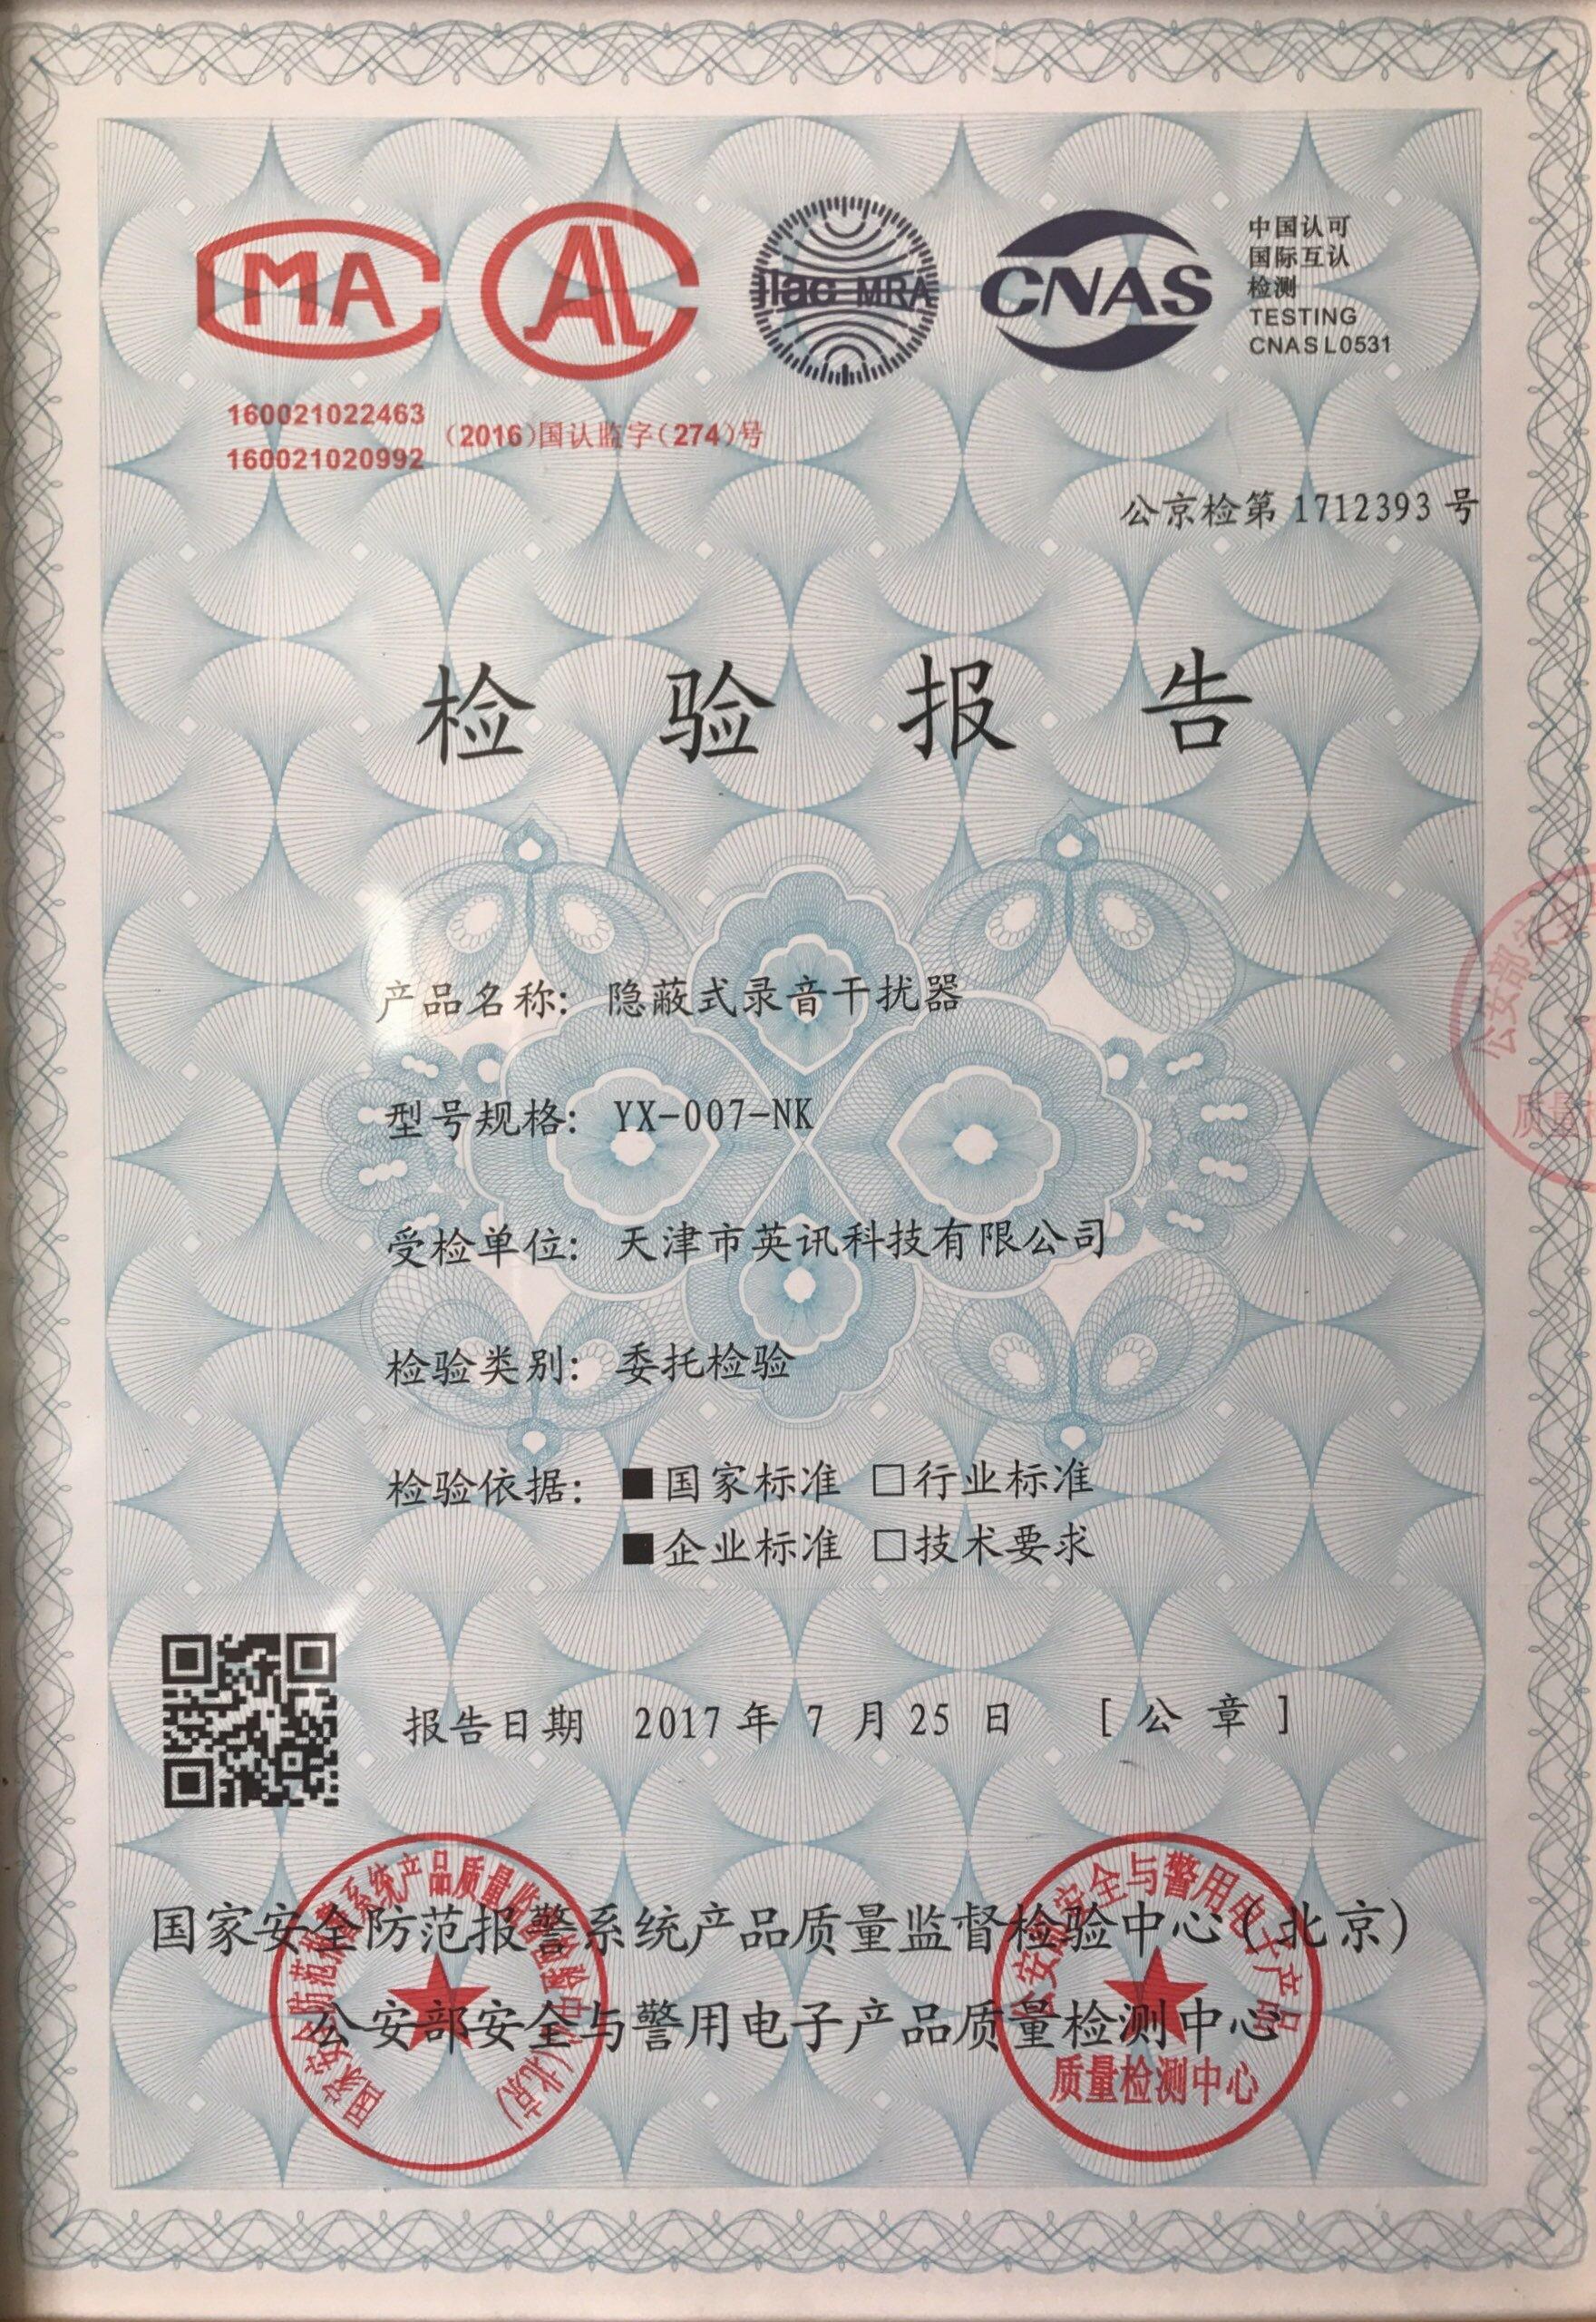 YX-007-NK 空气净化器型无声录音屏蔽器,录音干扰器,防录音屏蔽器,隐蔽式示例图2